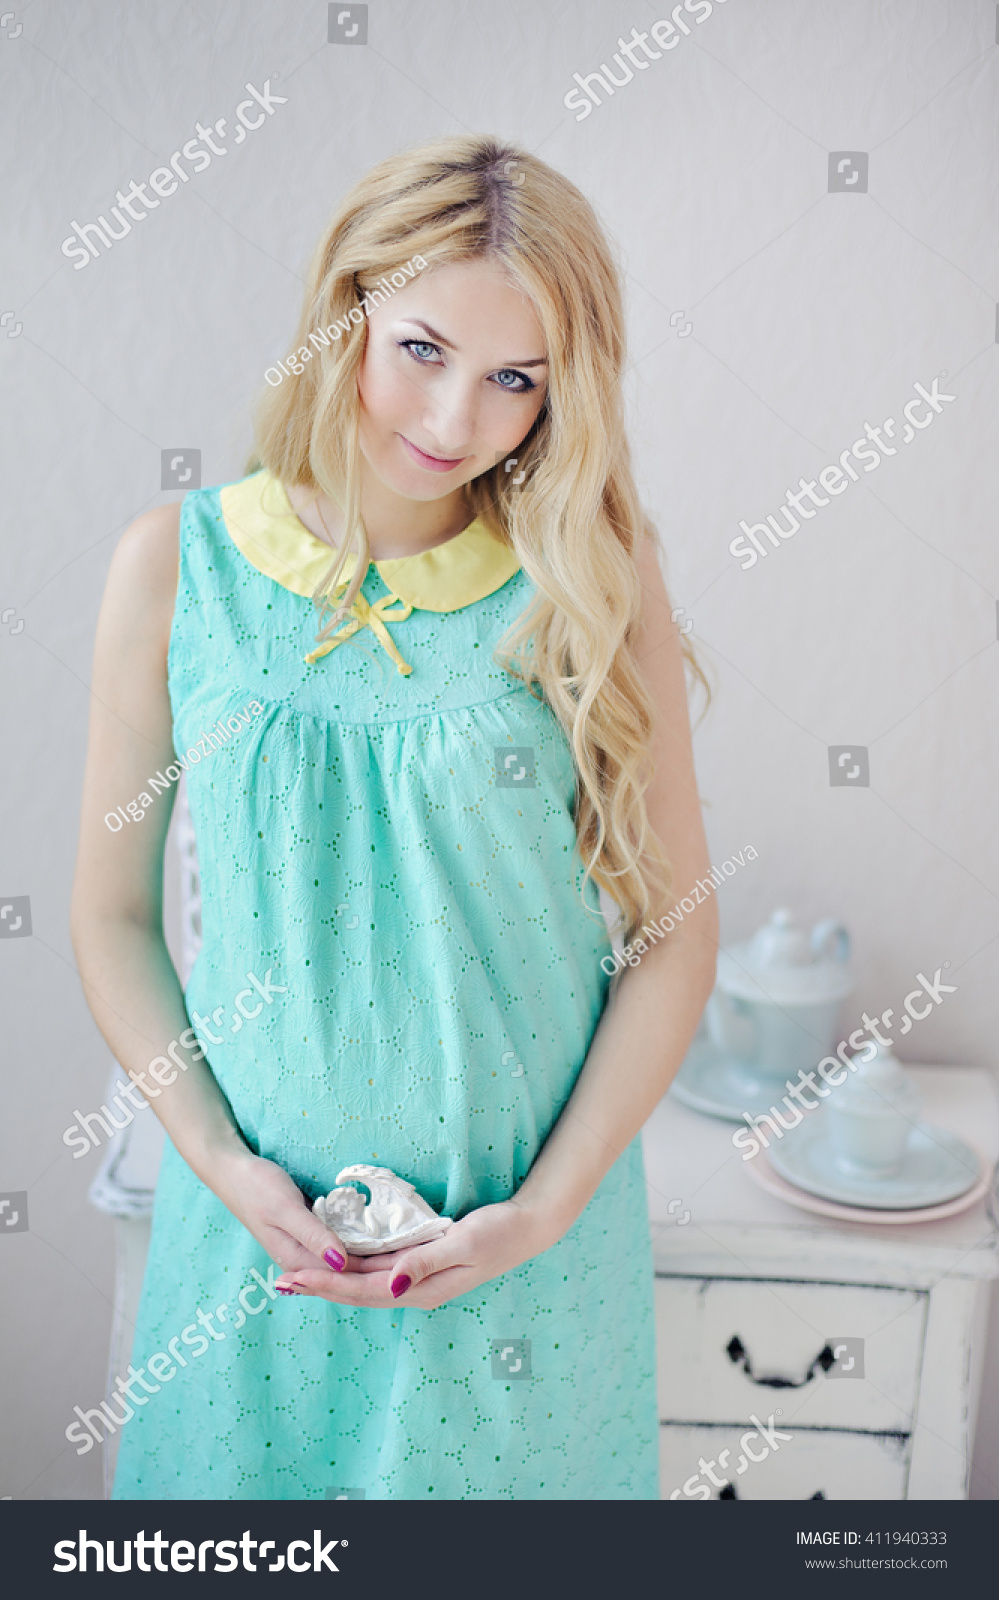 Pregnant Woman Blond Hair Mint Color Stock Photo Edit Now